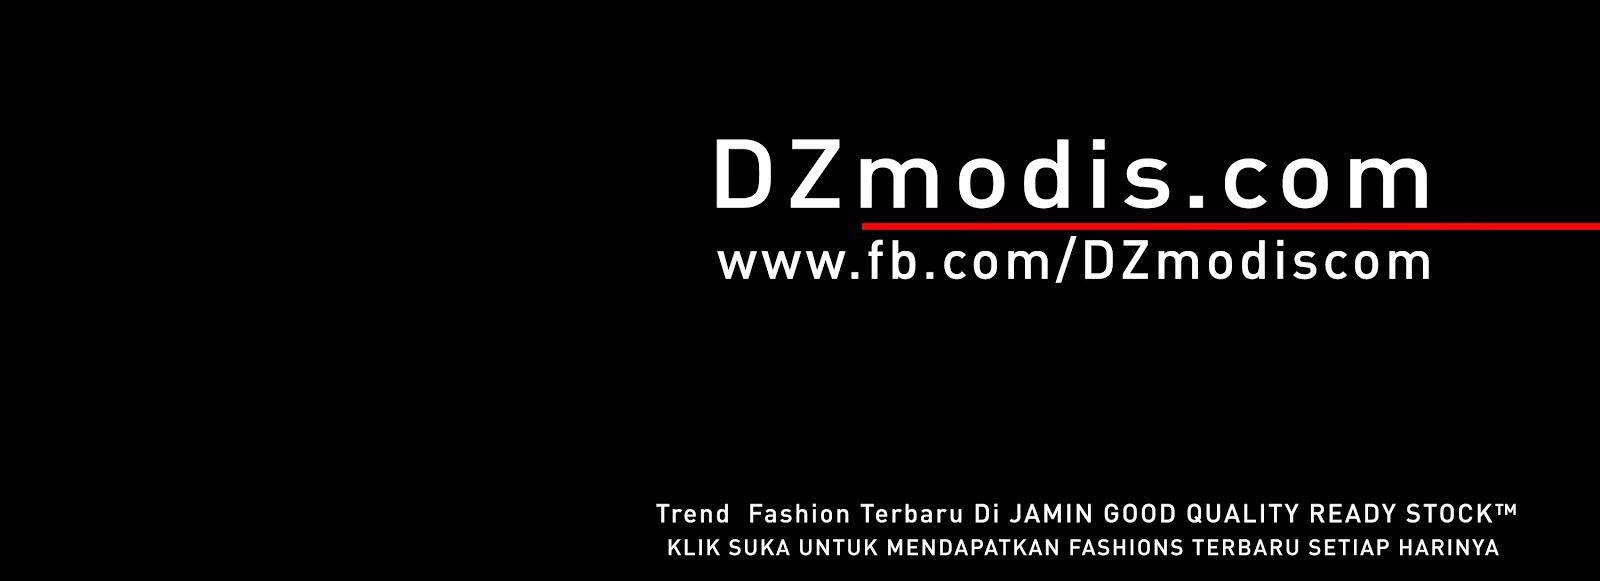 Grosir Baju Wanita - Supplier Tas Import by DZmodis.com